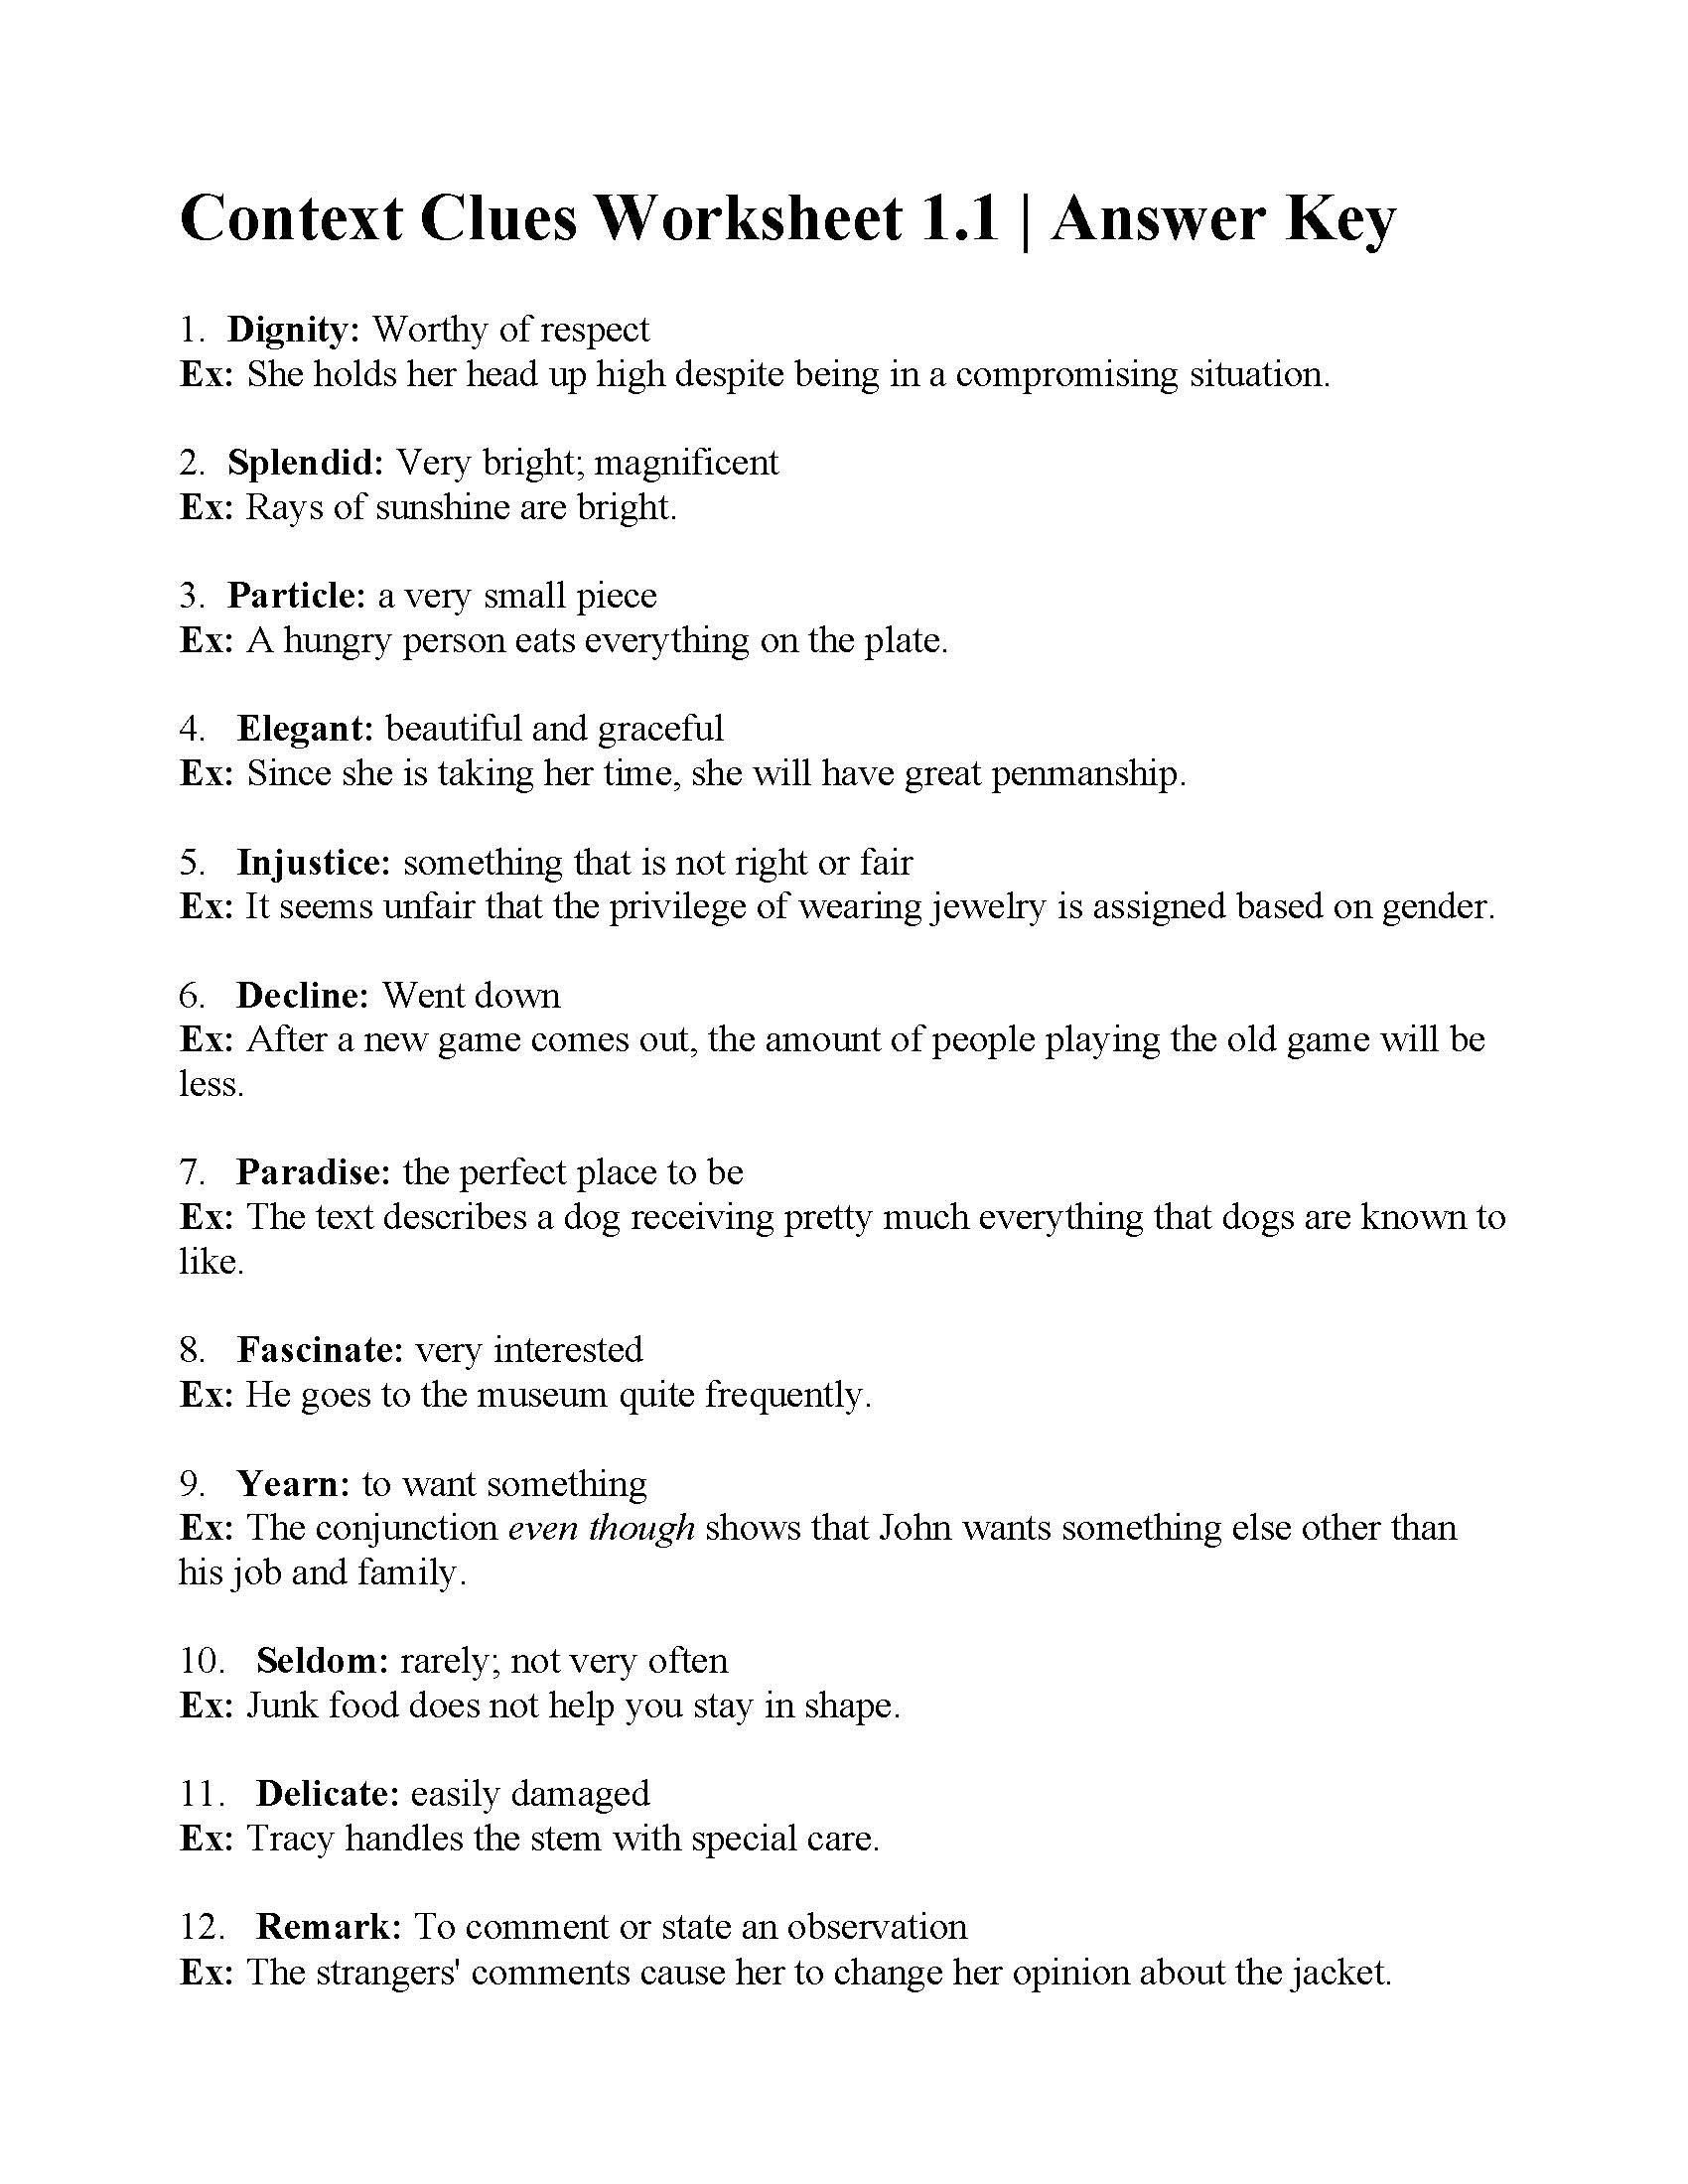 2nd Grade Context Clues Worksheets 38 Interesting Context